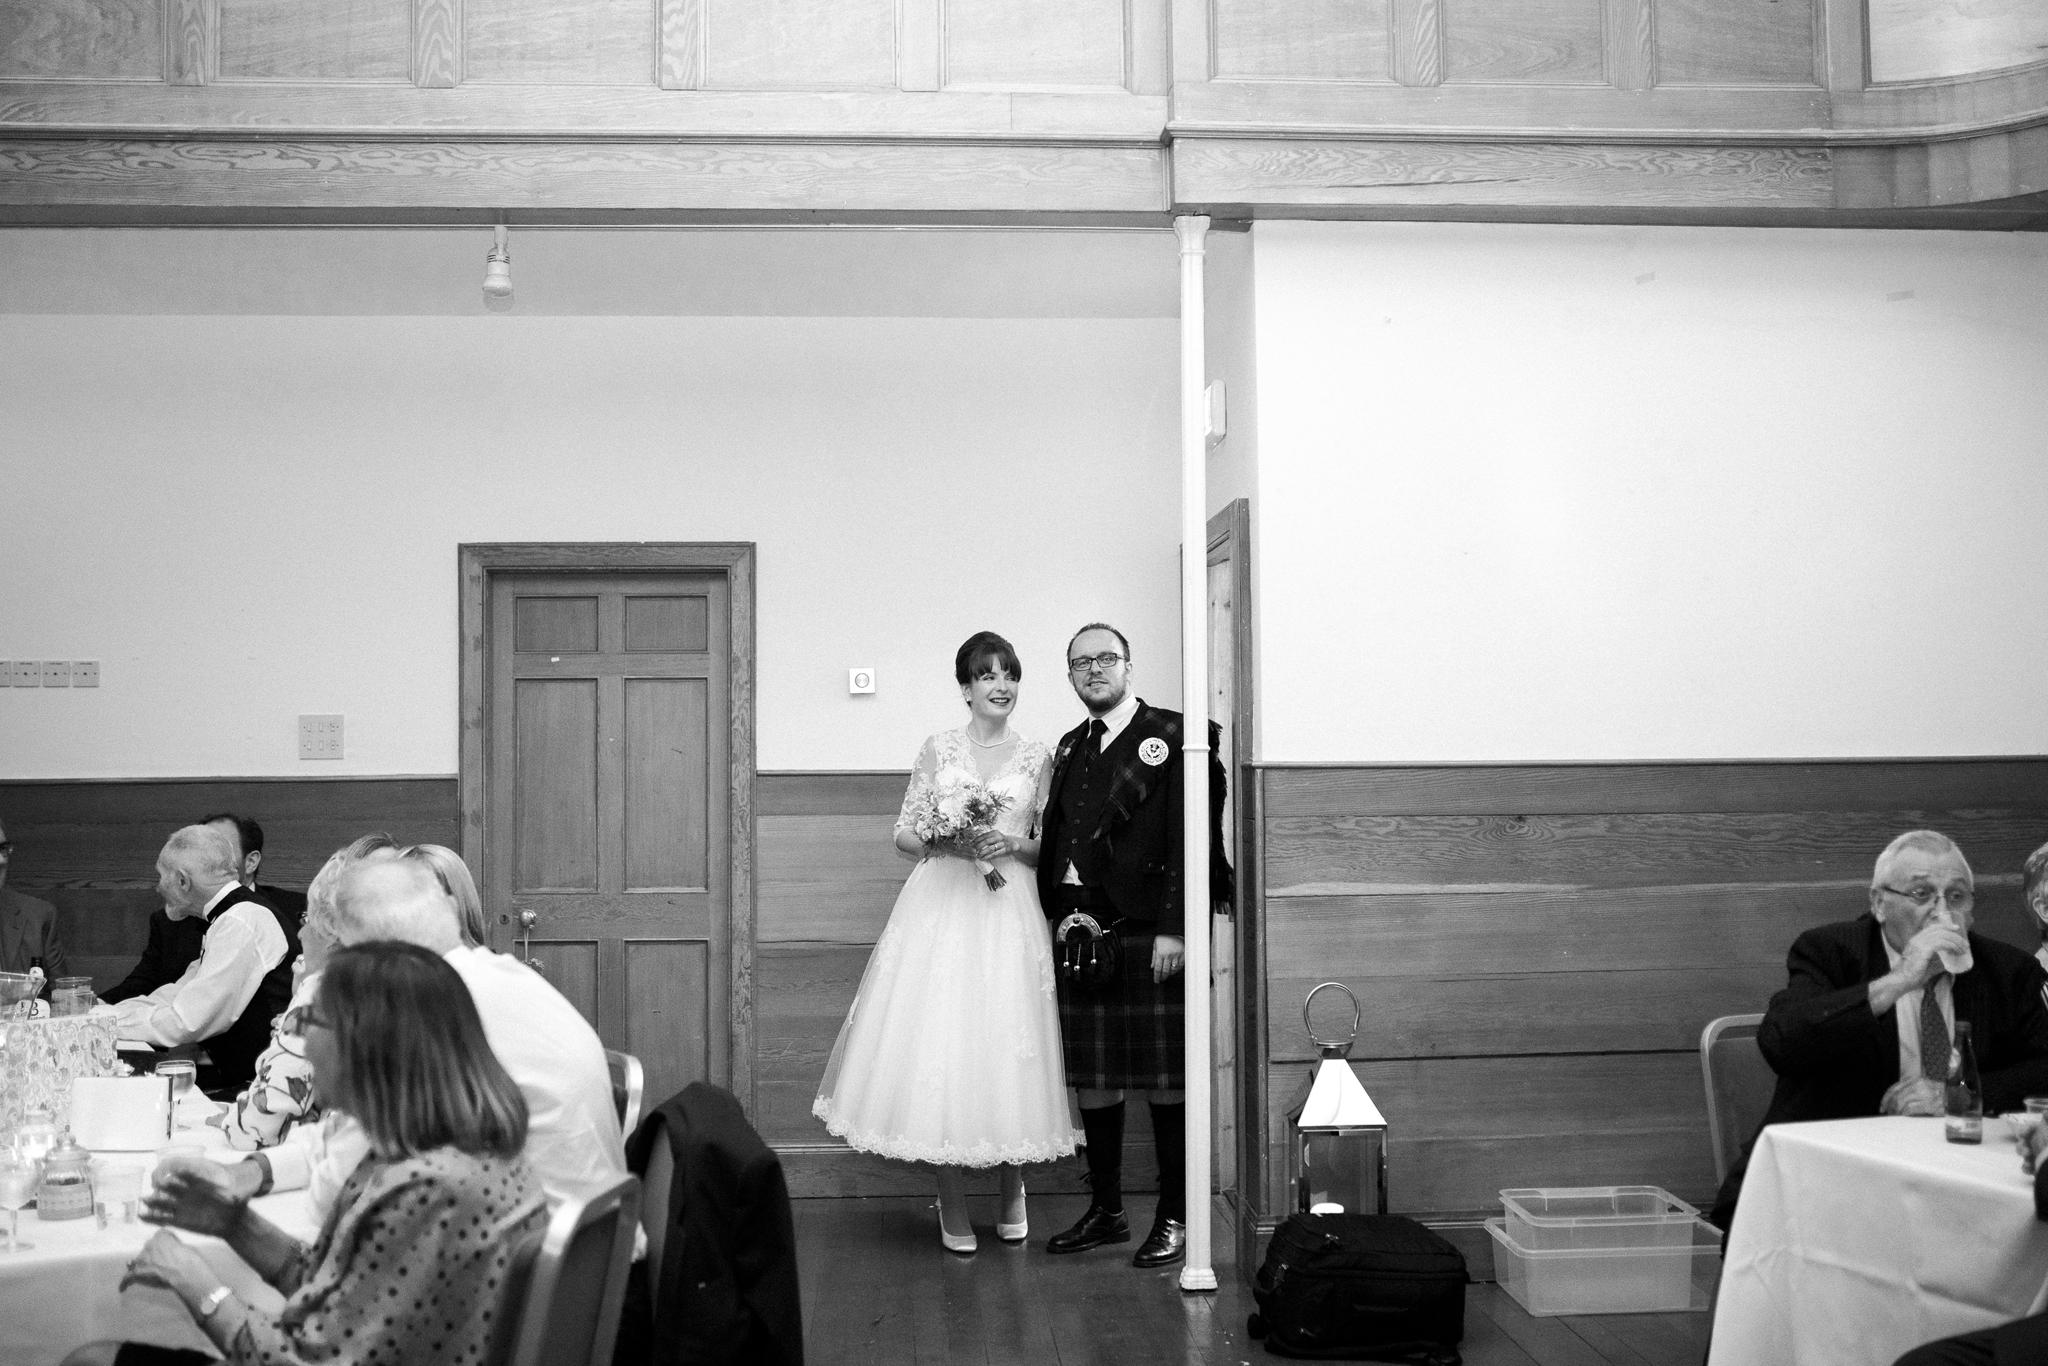 106-destination-wedding-photographer.jpg